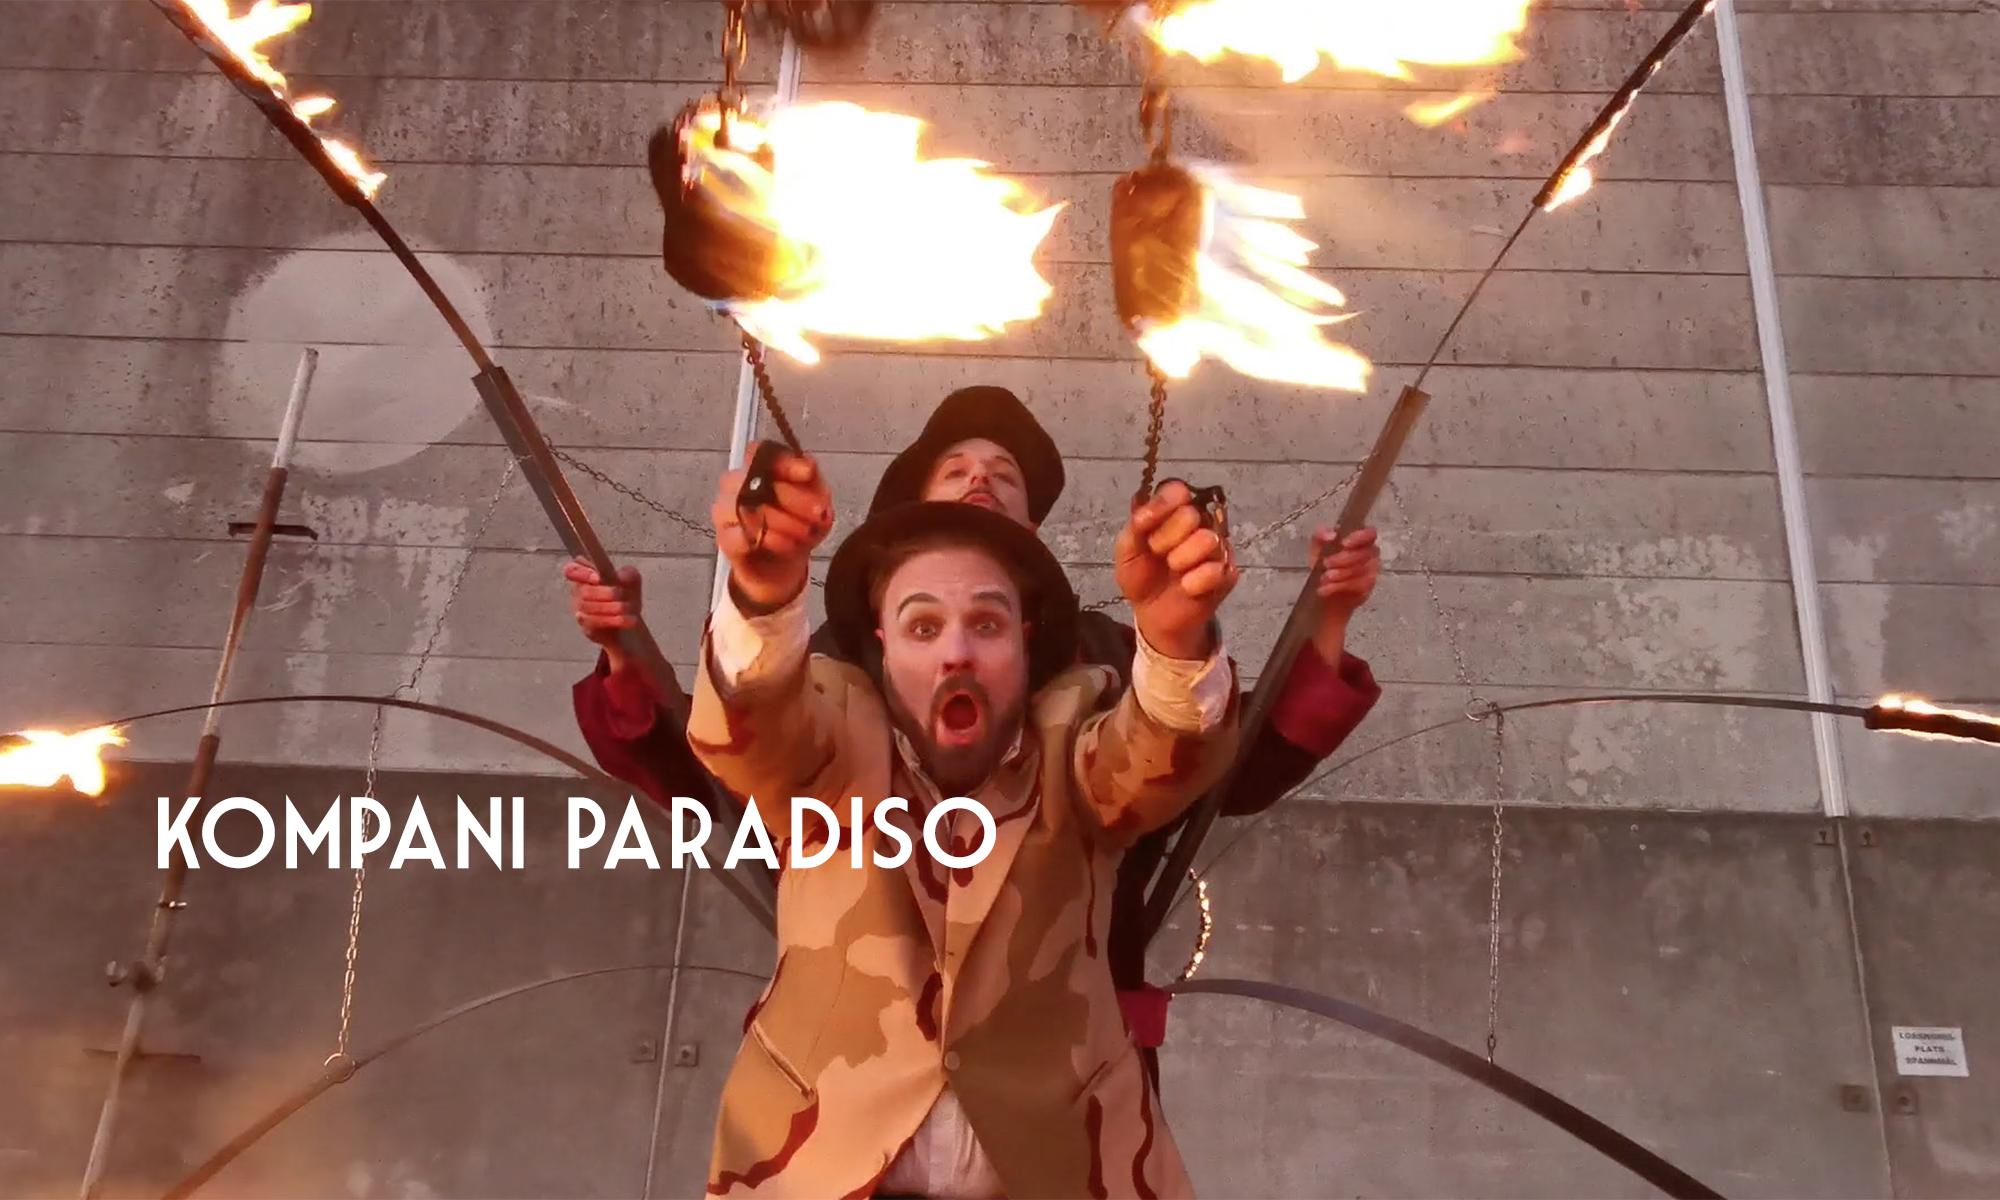 Kompani Paradiso